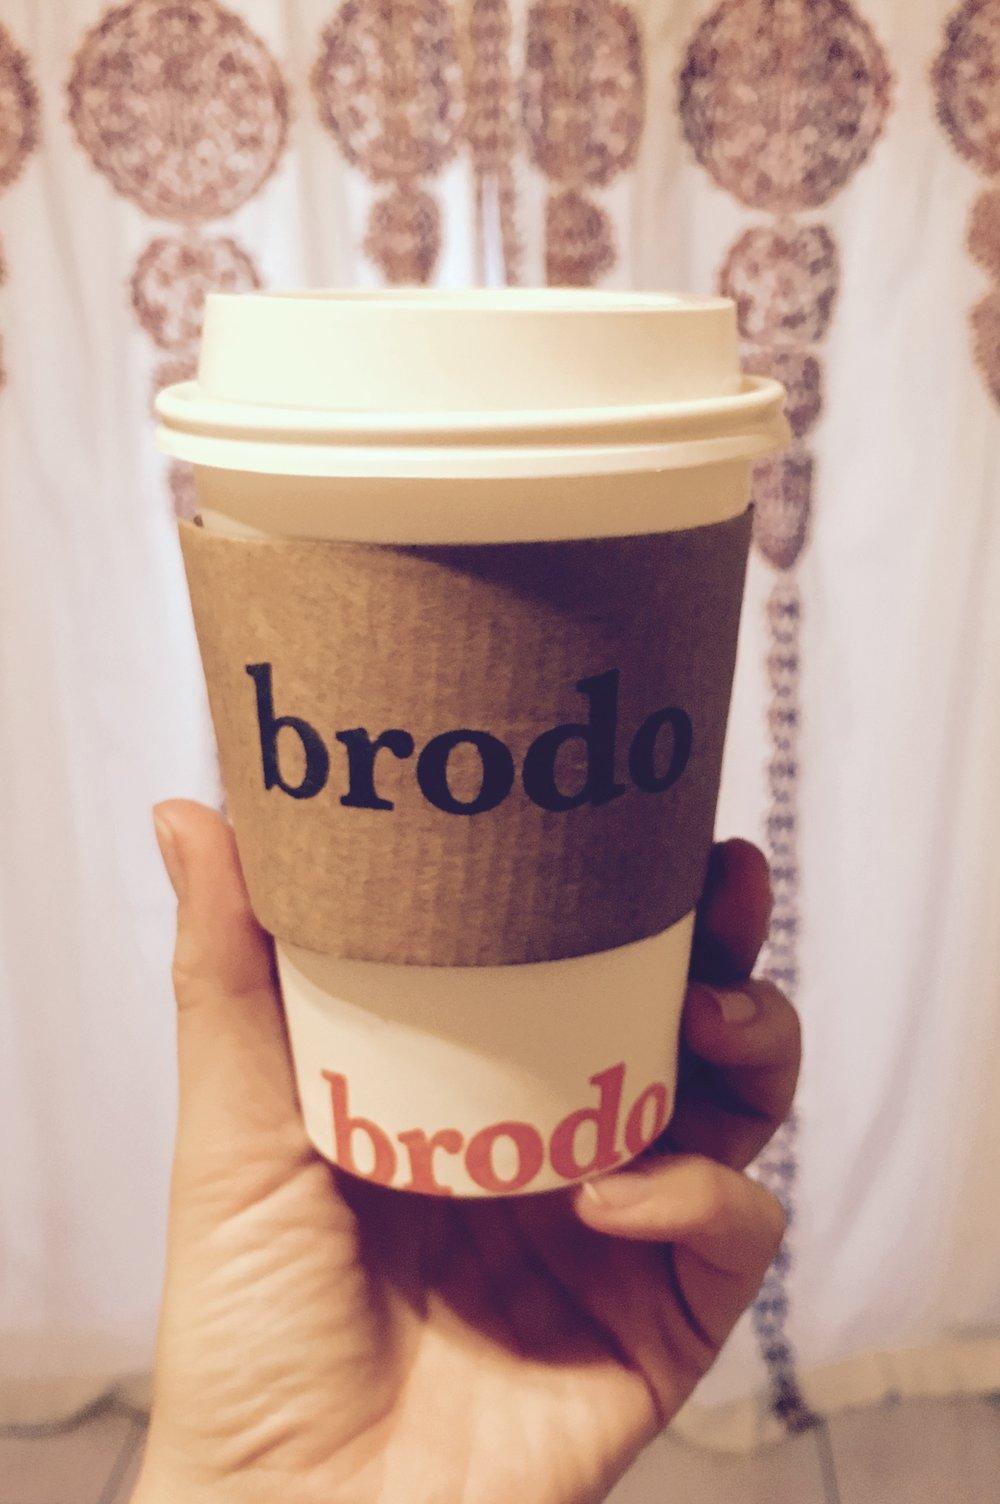 brodo nyc east village deenie hartzog-mislock